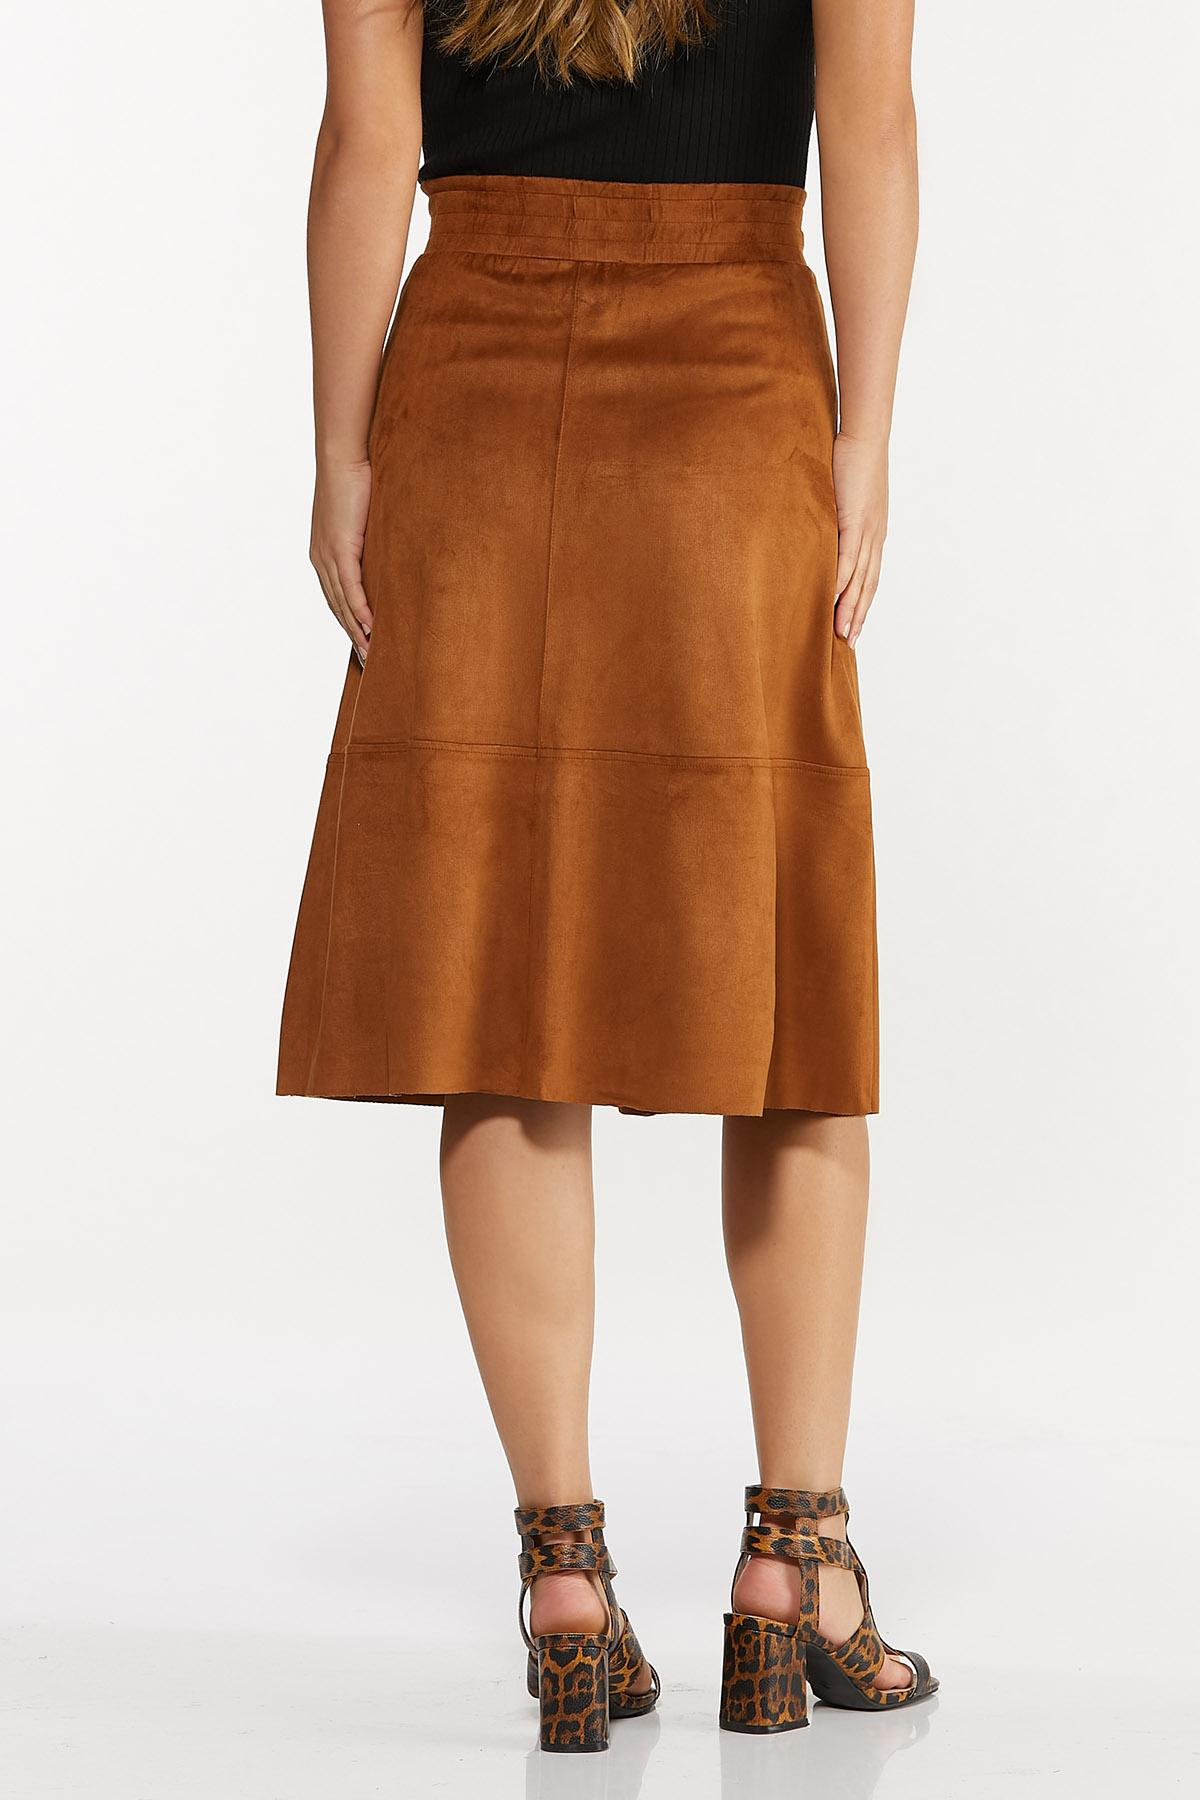 Faux Suede Midi Skirt (Item #44652203)